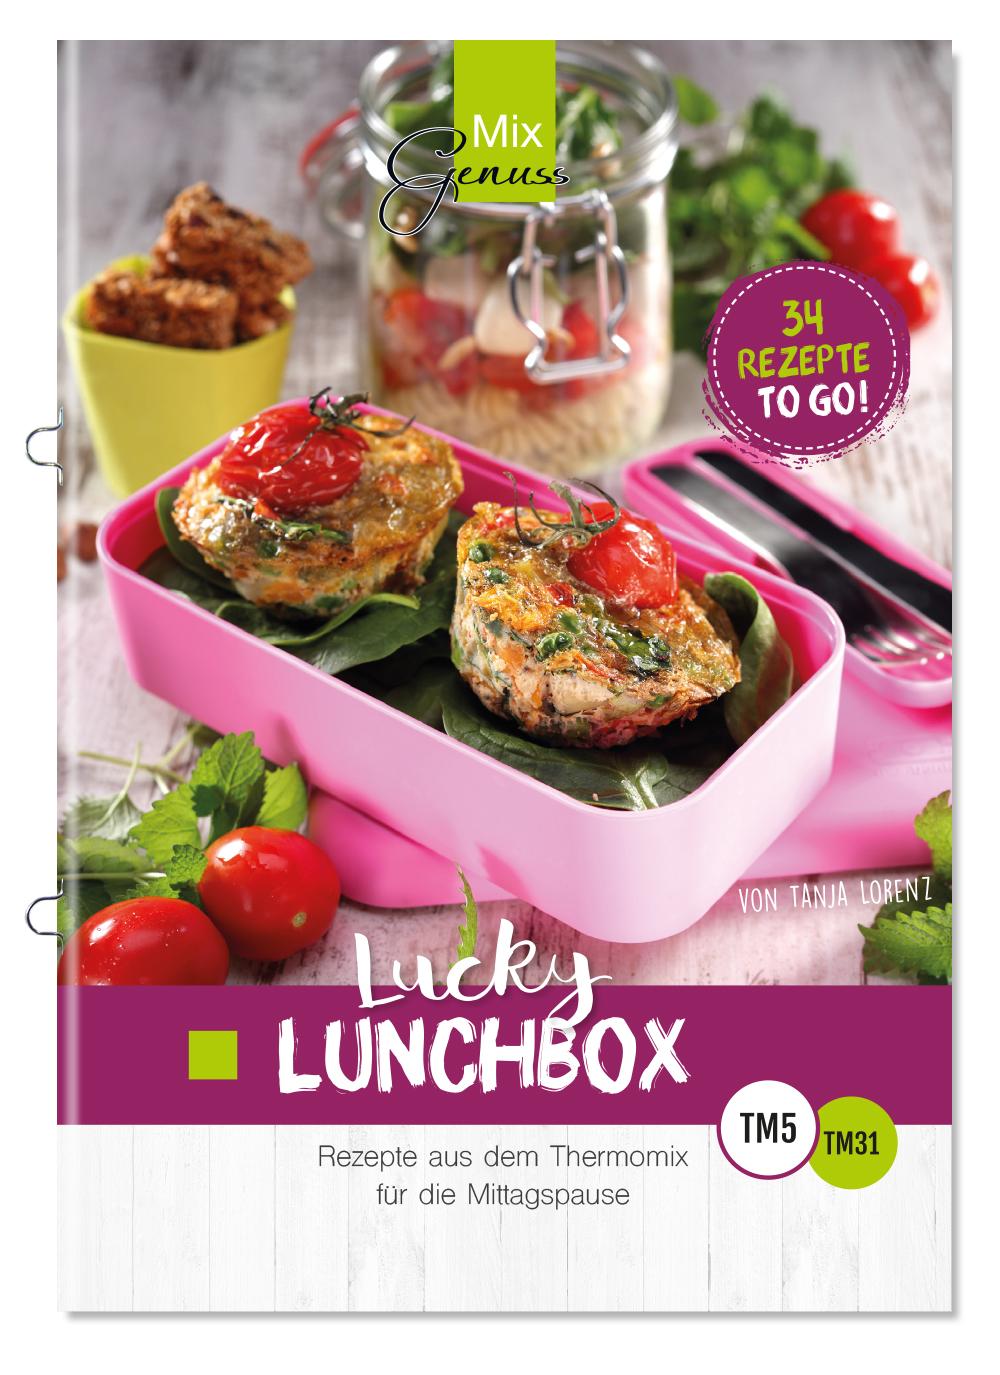 Lucky LUNCHBOX, Tanja Lorenz